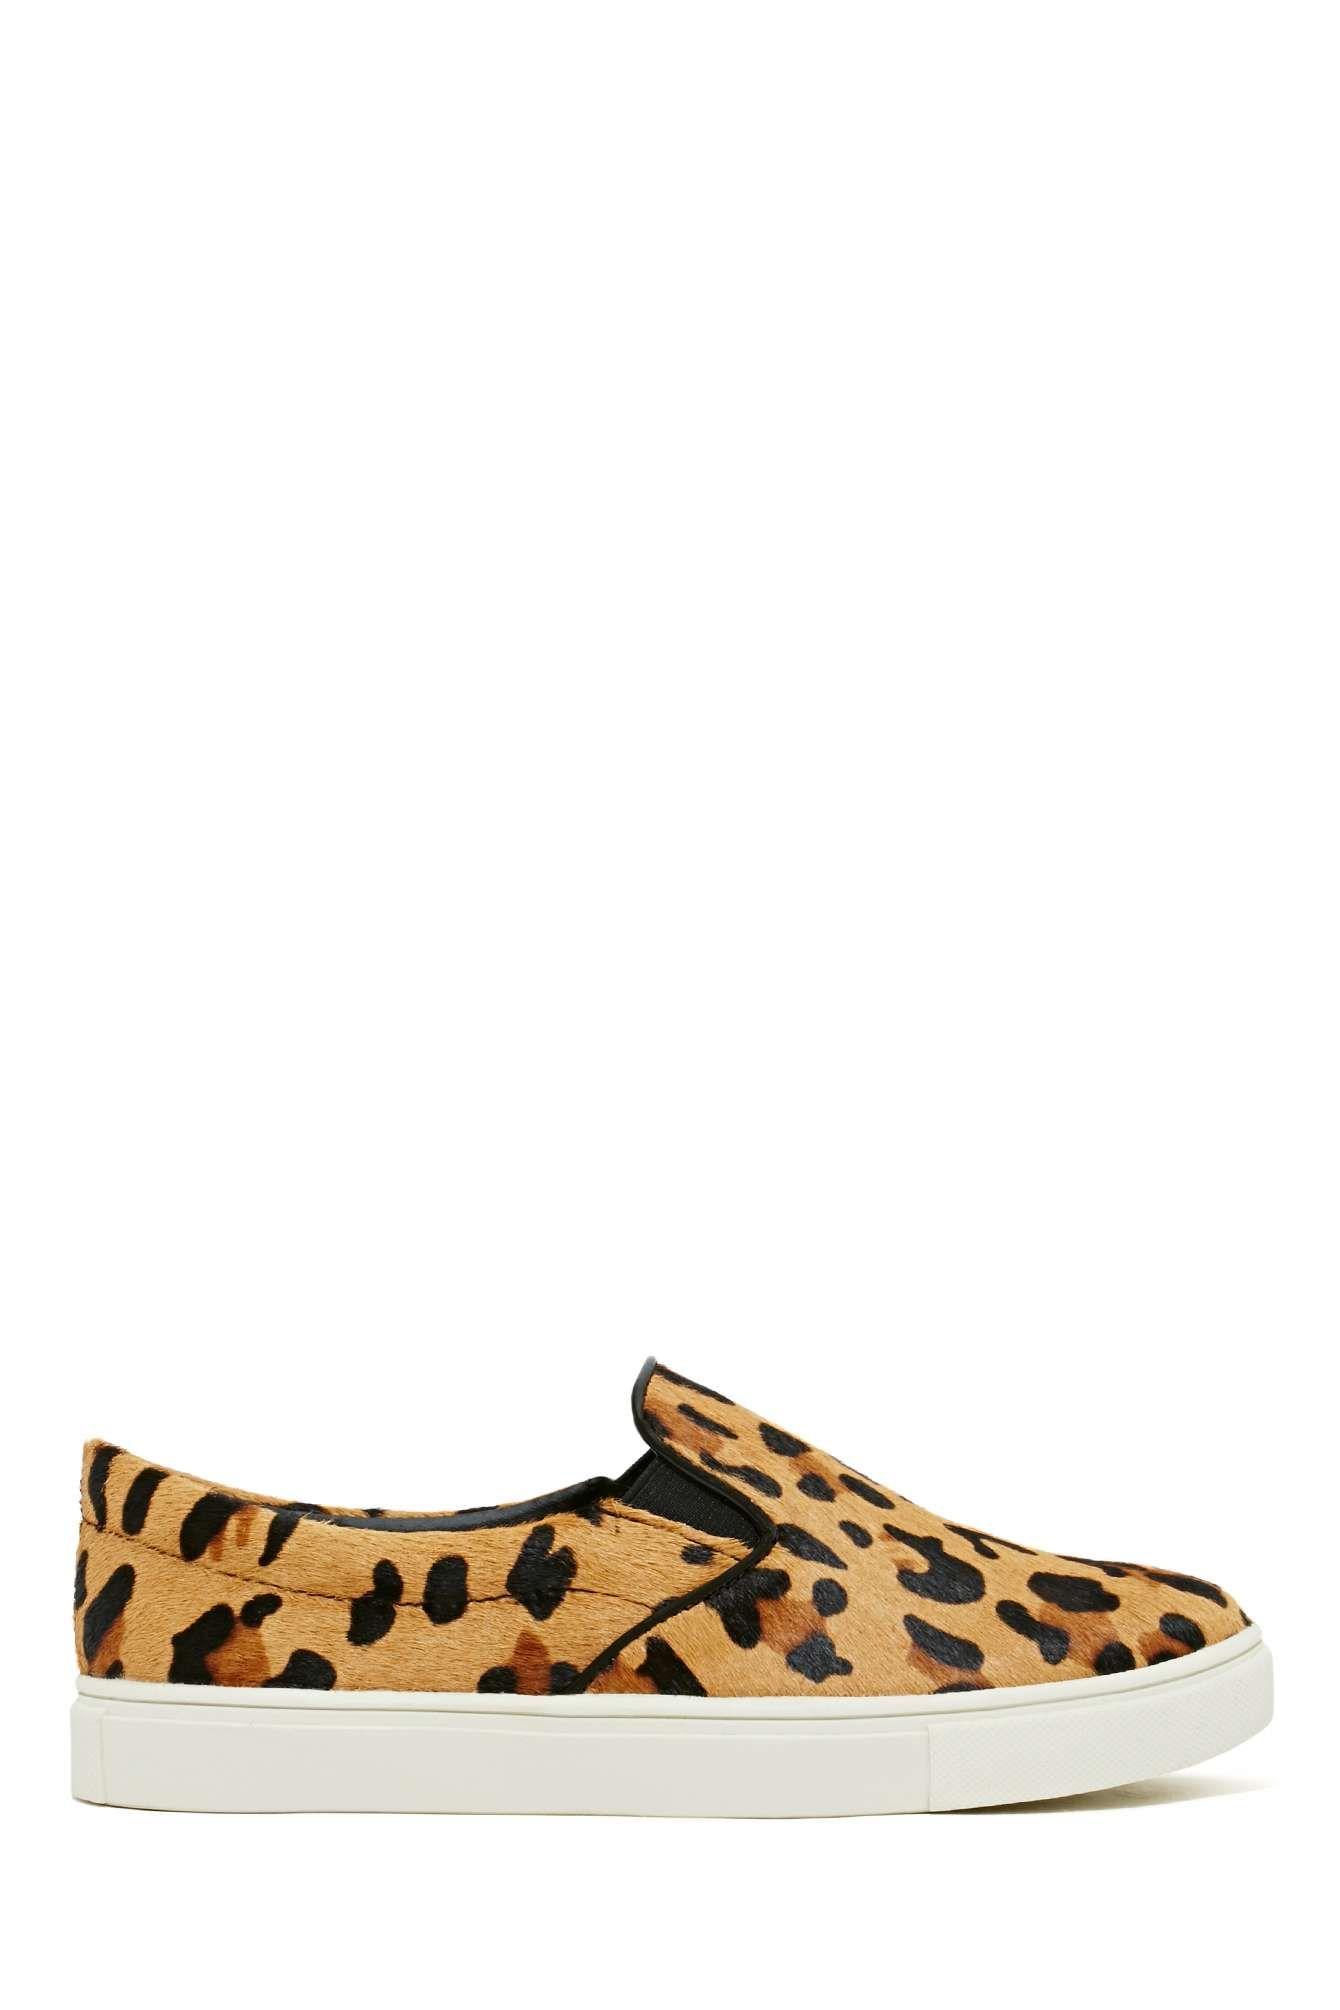 a664bdb4952 Steve Madden Eccentric Pony Hair Sneaker - Leopard | Shop Sneakers ...